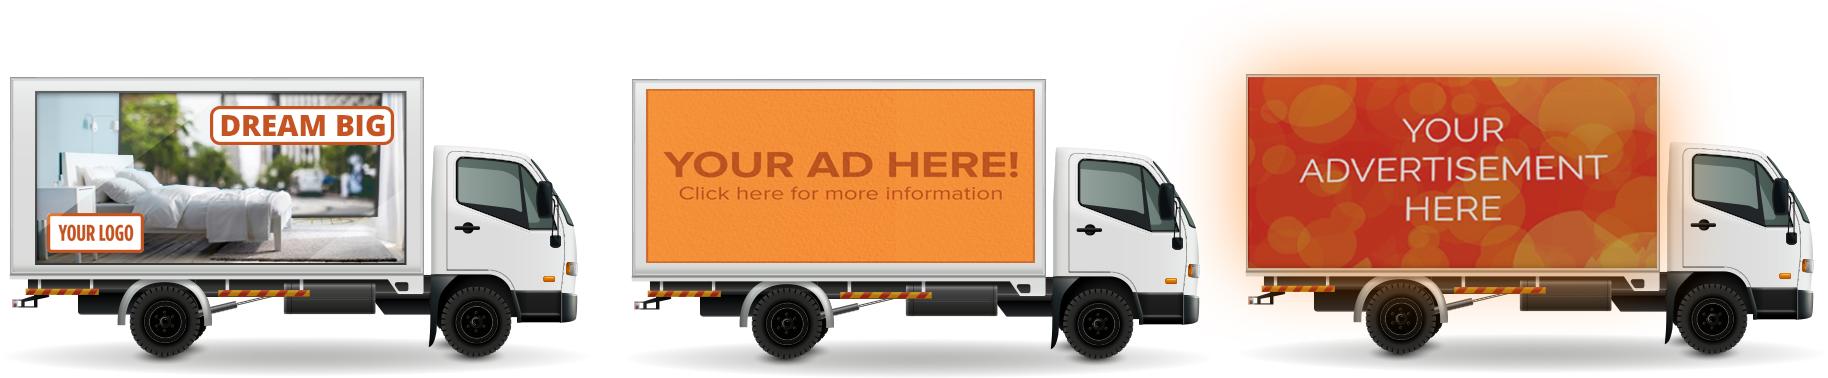 Mobile Billboard Rental Truck | Mobile Outdoor Billboard Advertising Truck Companies | ILUMADS